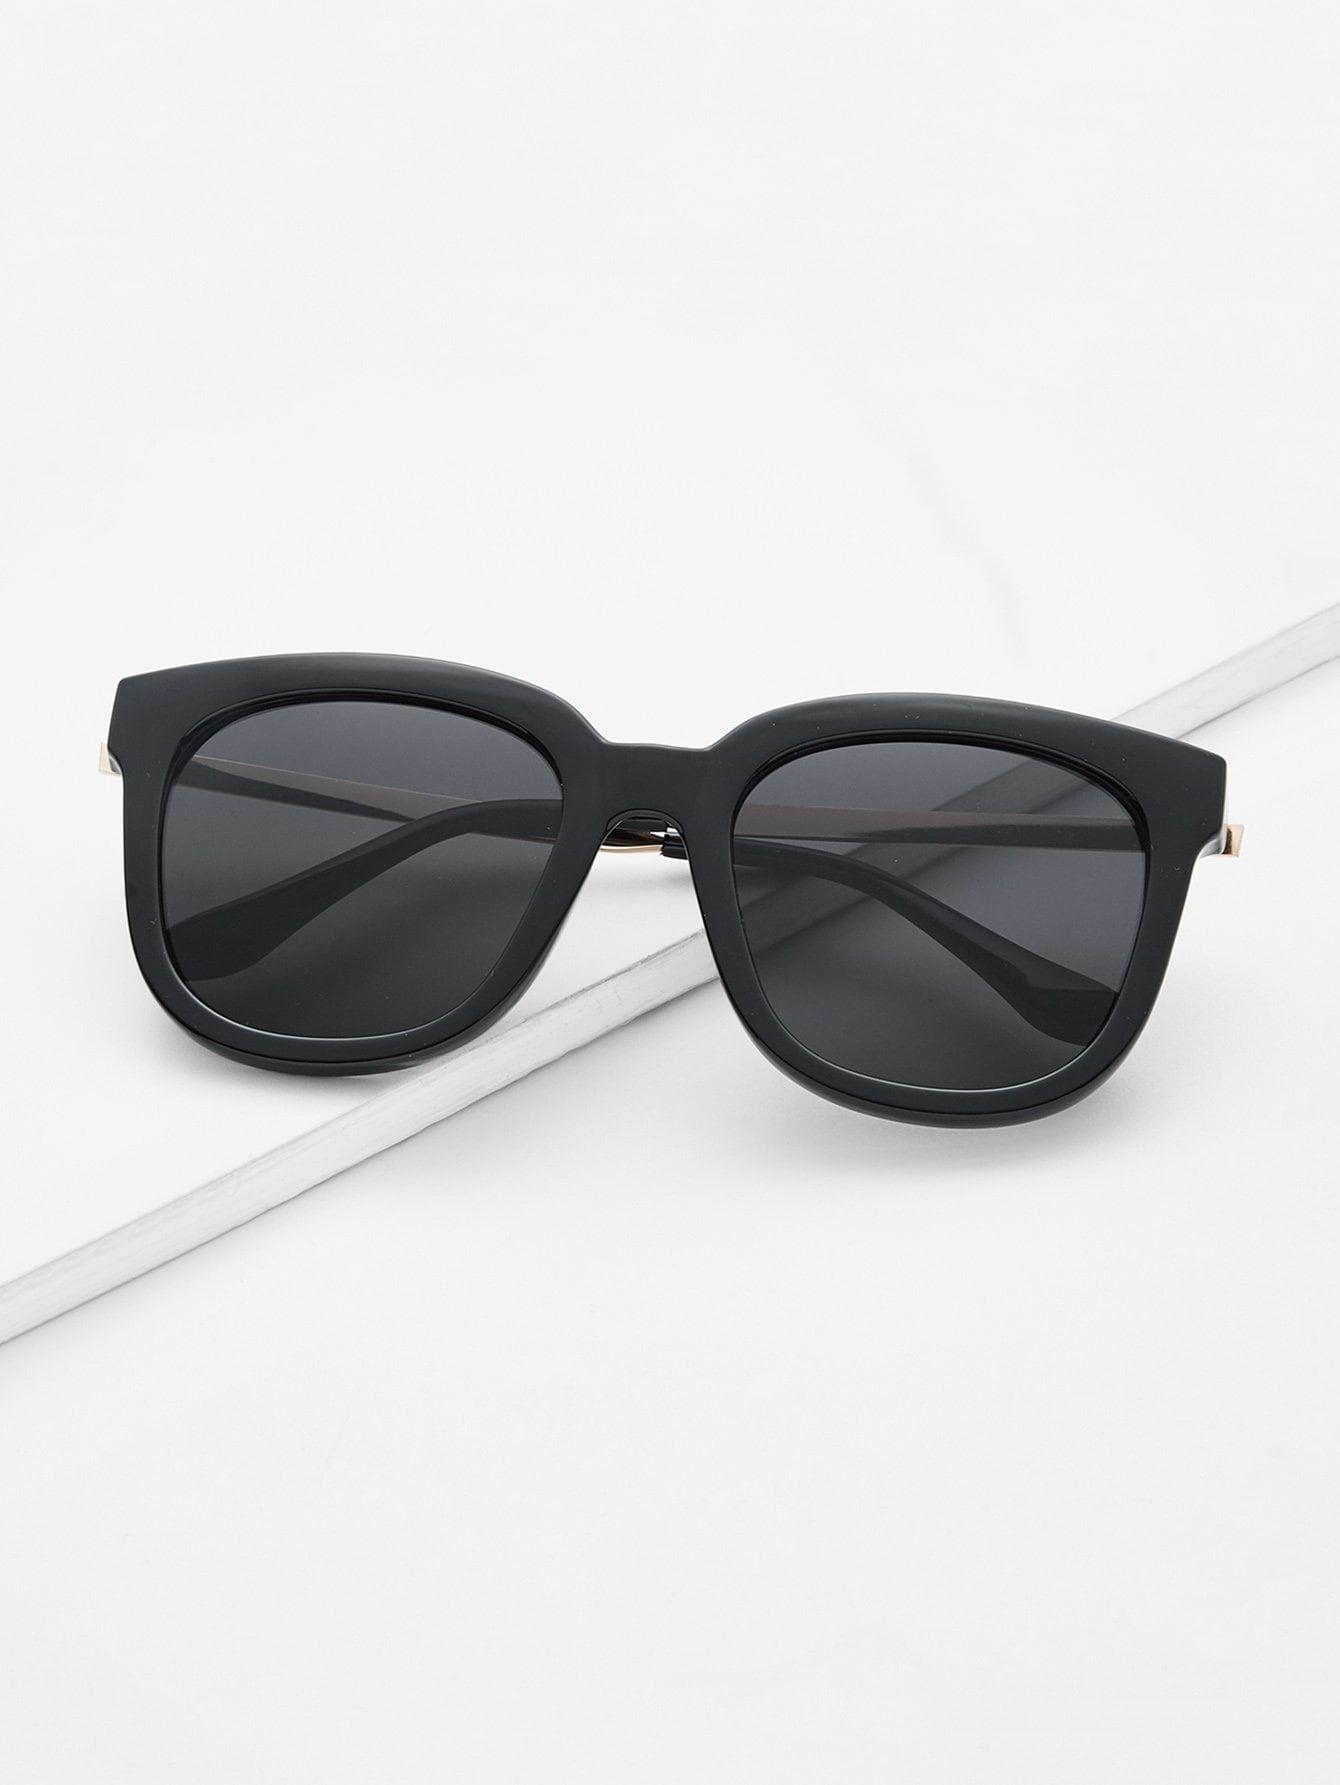 Gafas de sol lentes negro talla grande cuadrado -Spanish Romwe